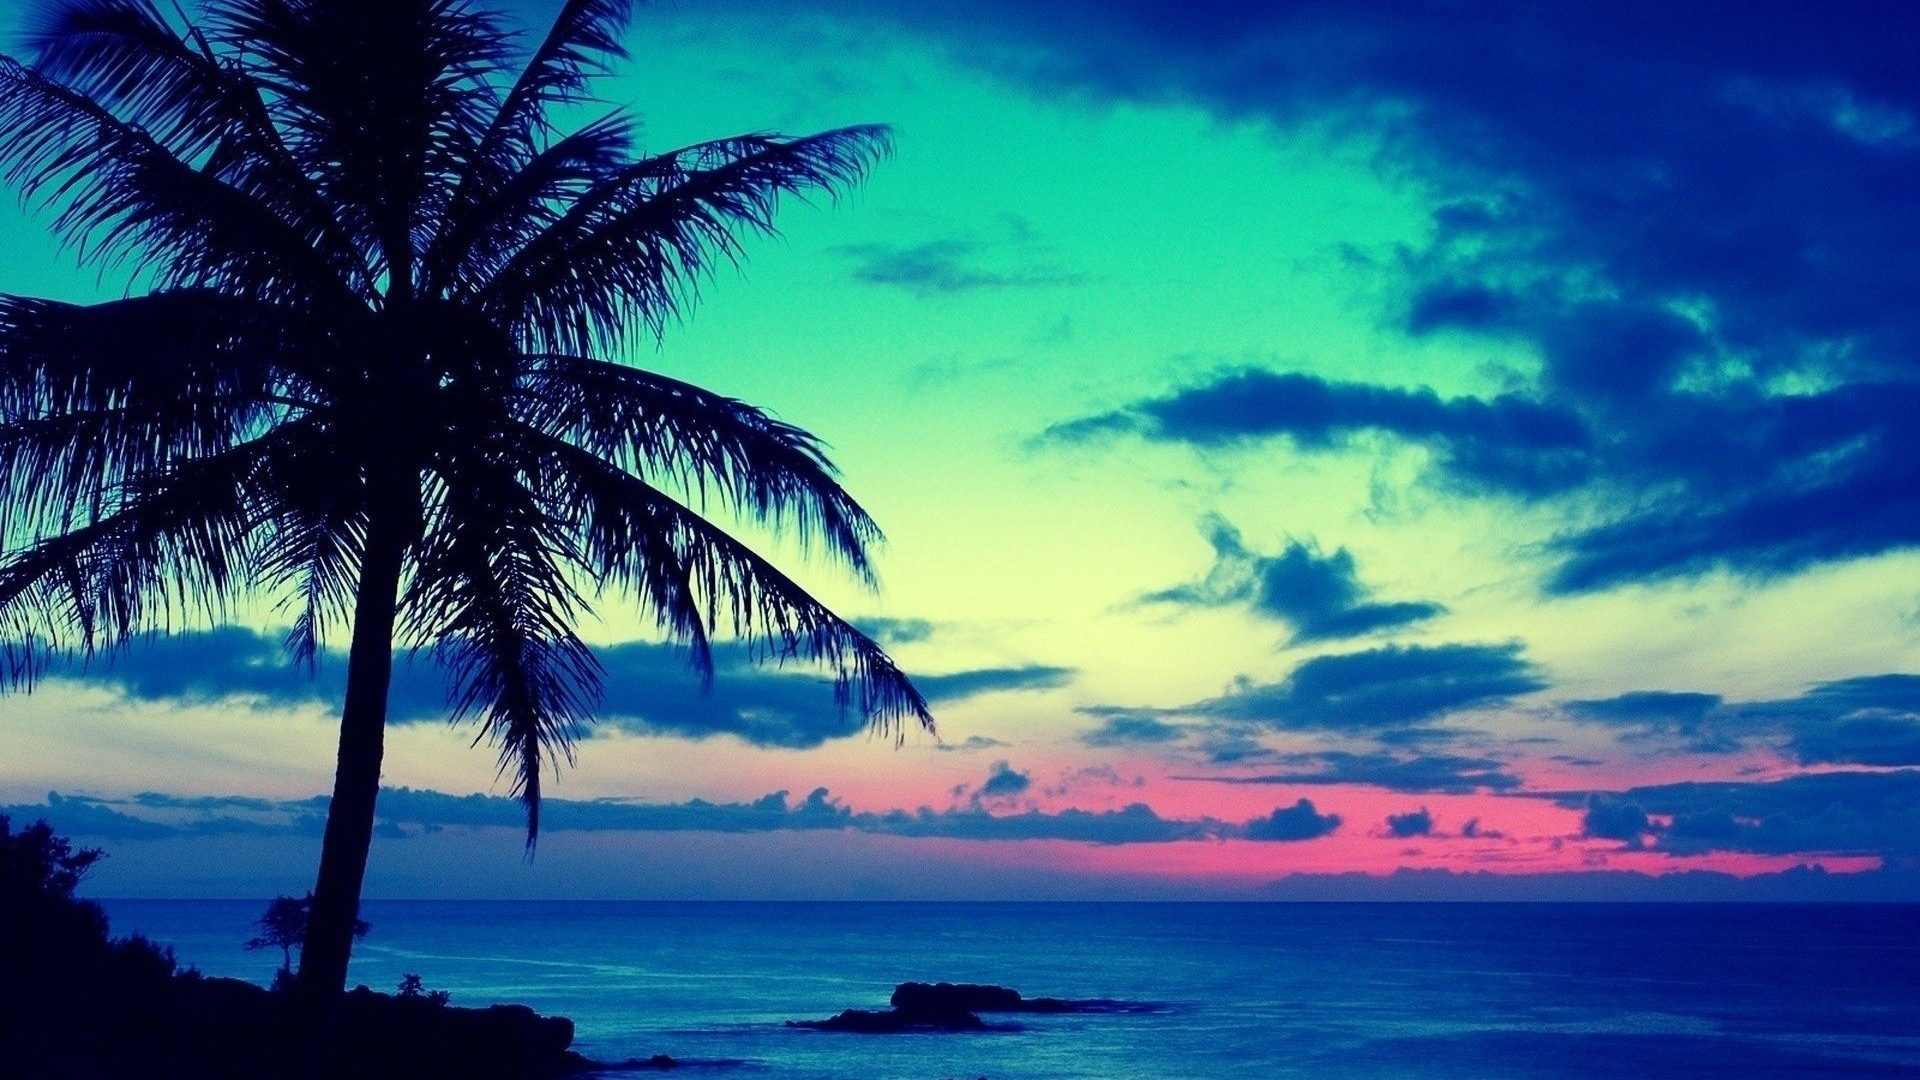 Blue Sun Ocean Rise Nature Beauty Sunrise Beach Live Wallpaper Windows 7 –  1920×1200